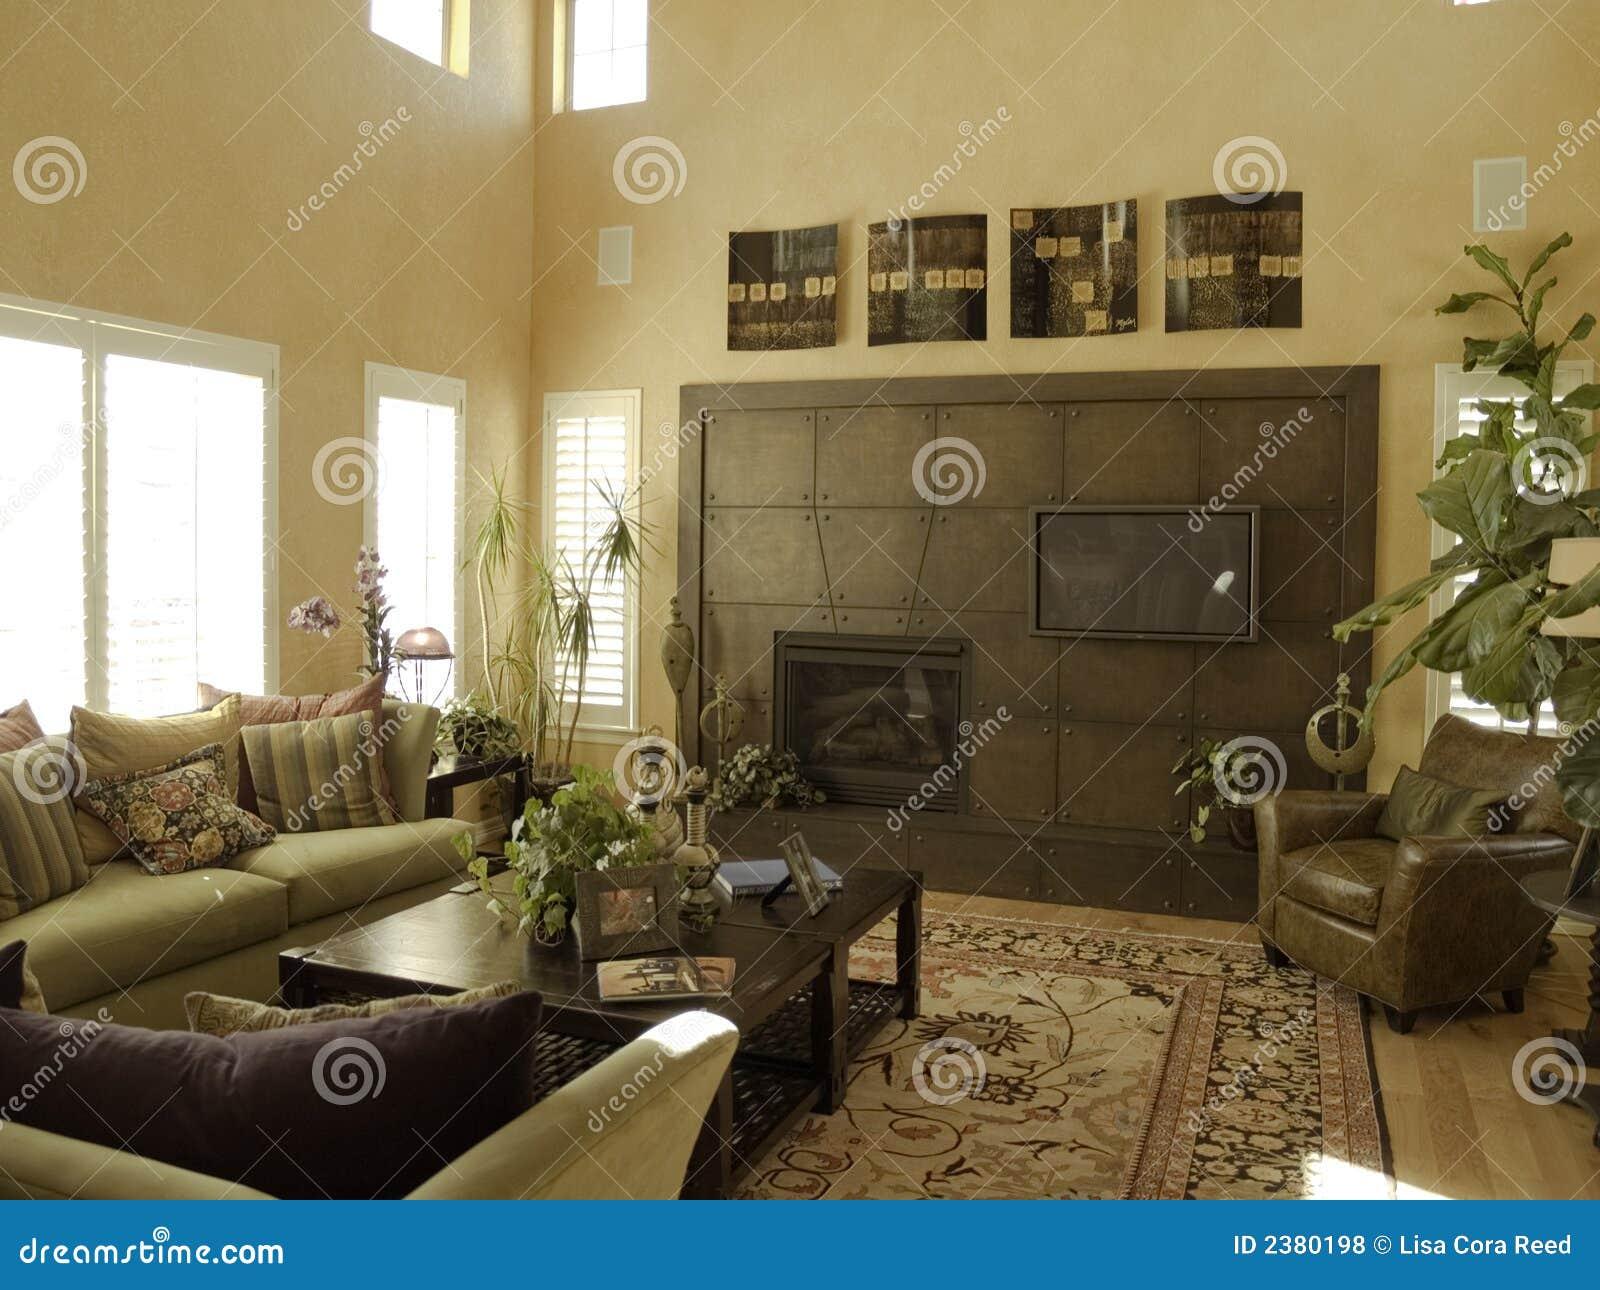 Interior Design Royalty Free Stock Photos Image 2380198